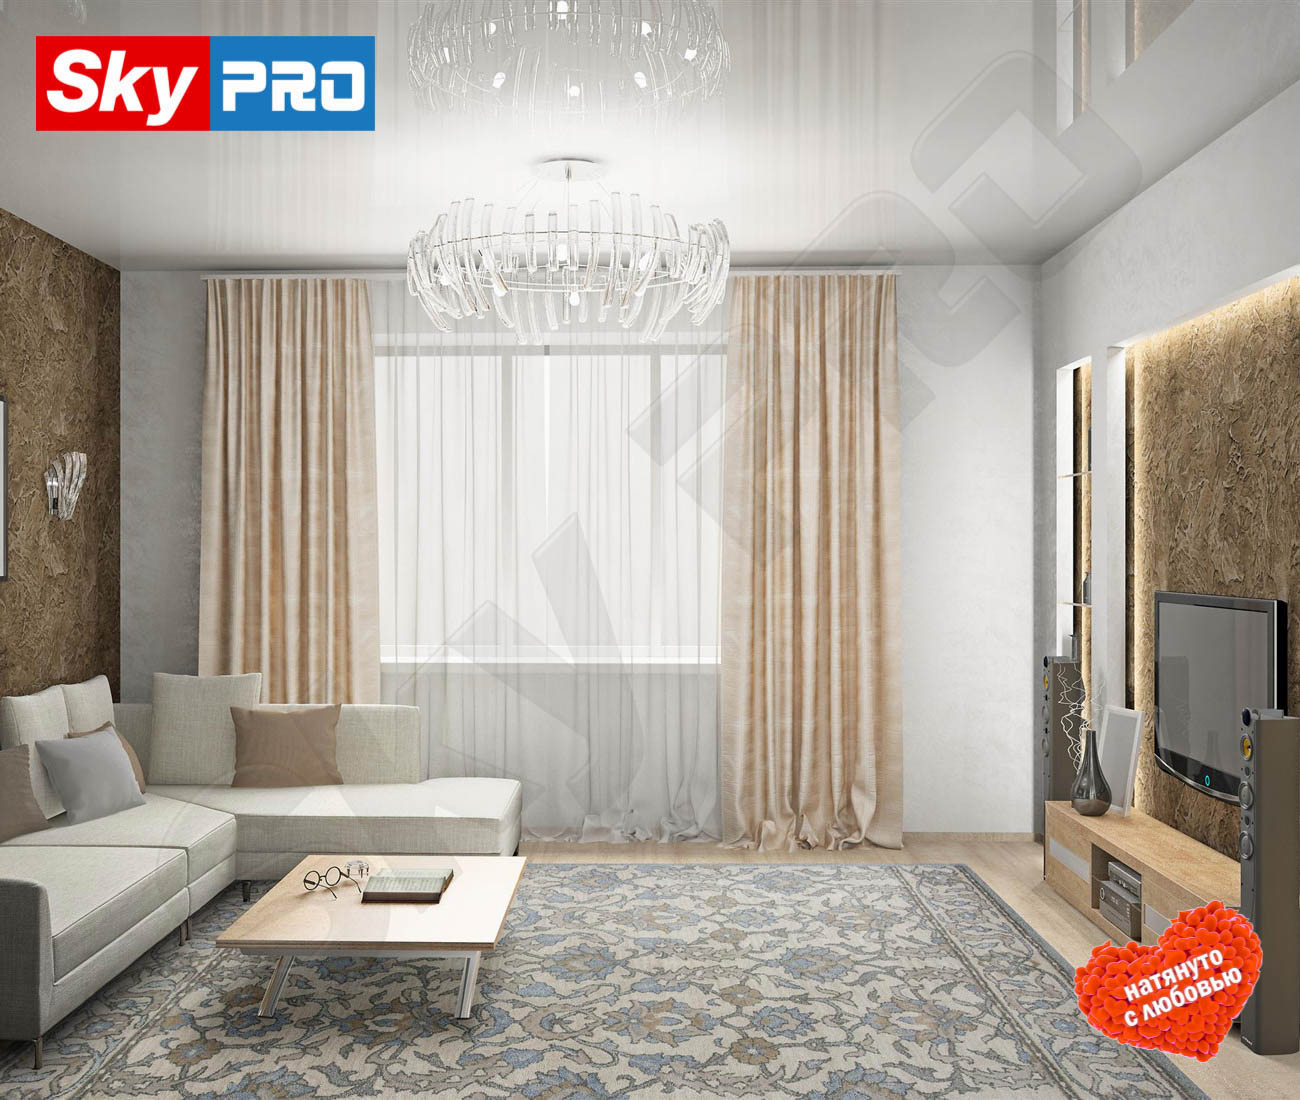 Белый глянцевый натяжной потолок цена за метр -> Kuchnia Lakierowana Cena Za Metr